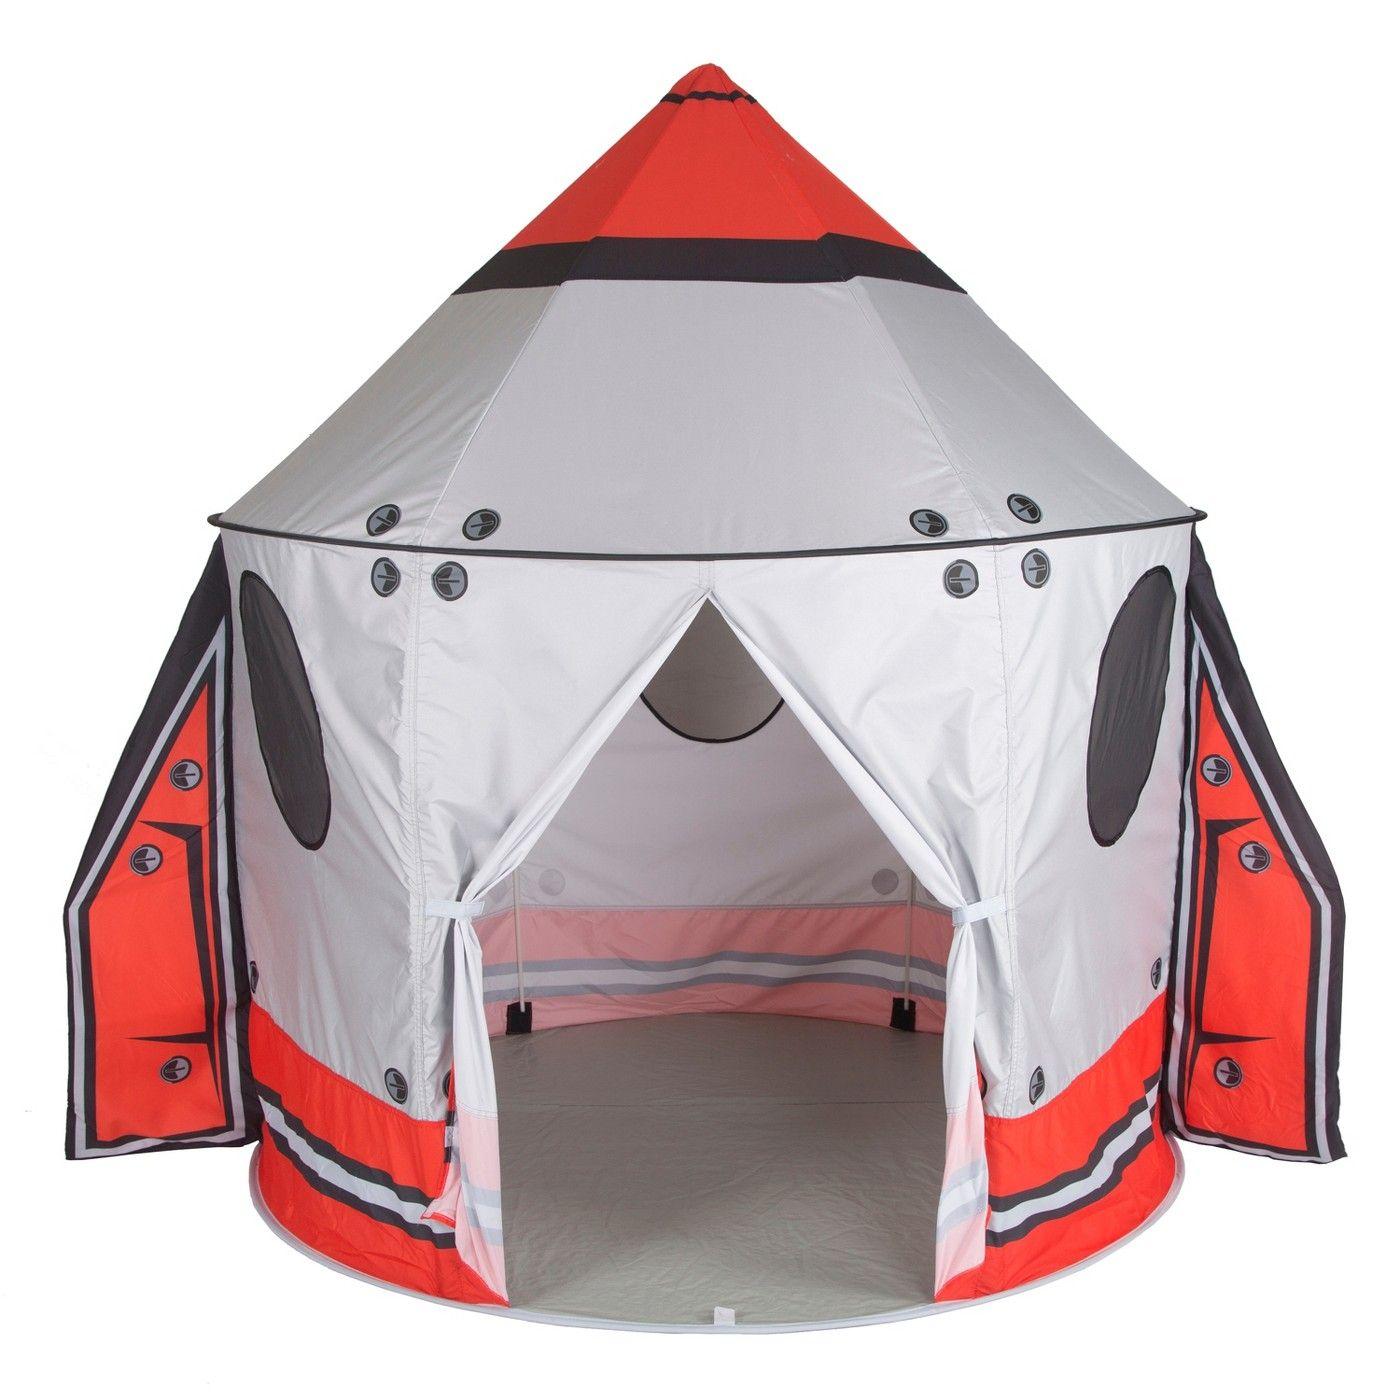 Pacific Play Tents Kids Classic Spaceship Peach Skin Play